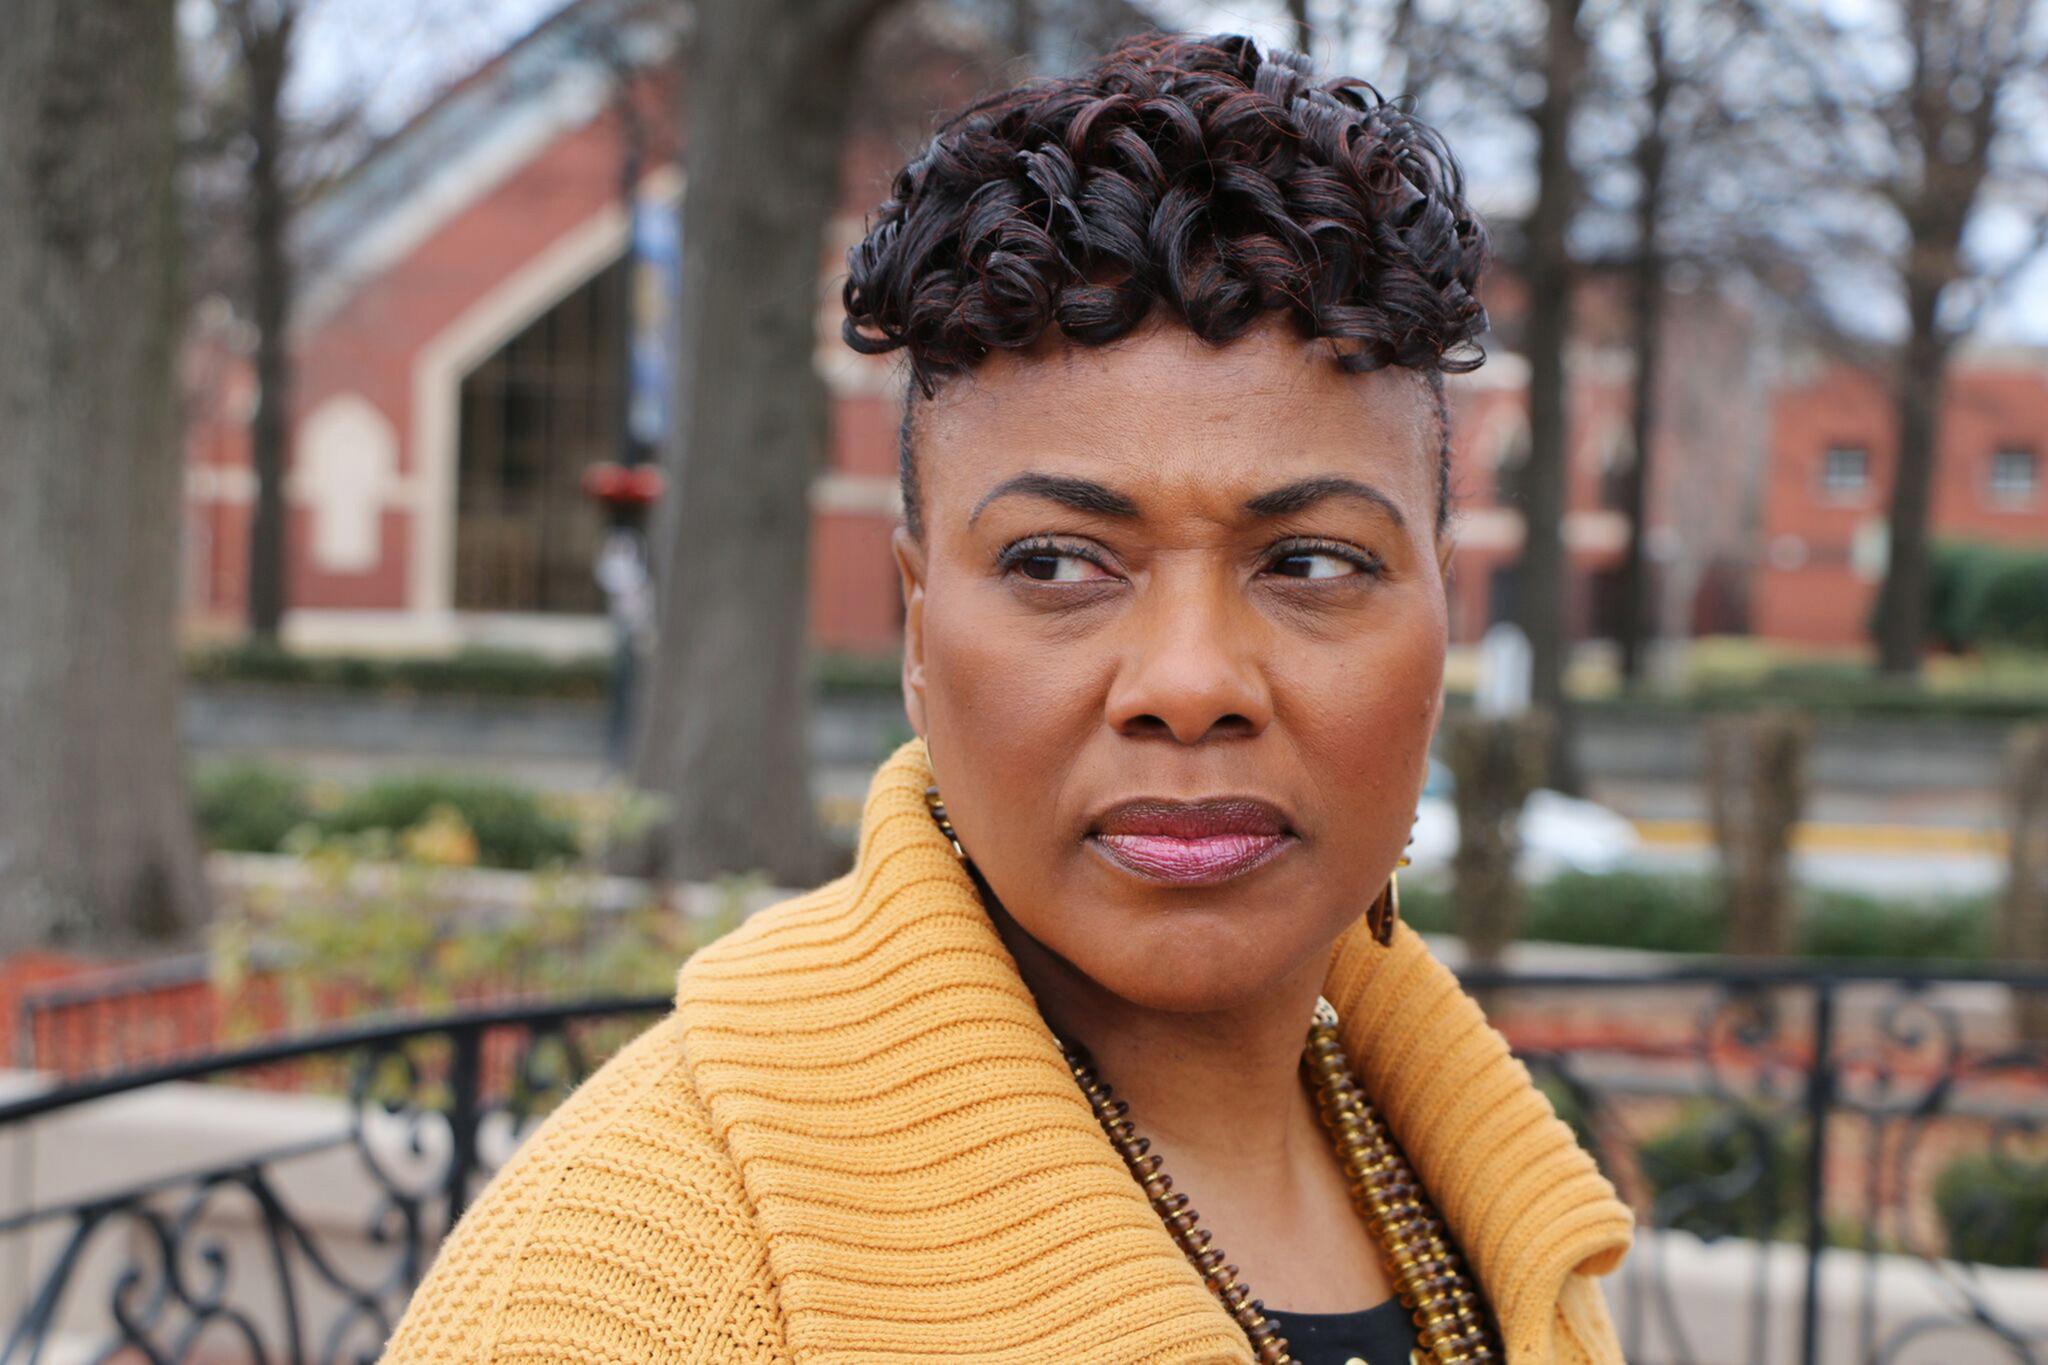 Republican governor names Bernice King, daughter of MLK, to lead Georgia coronavirus outreach group